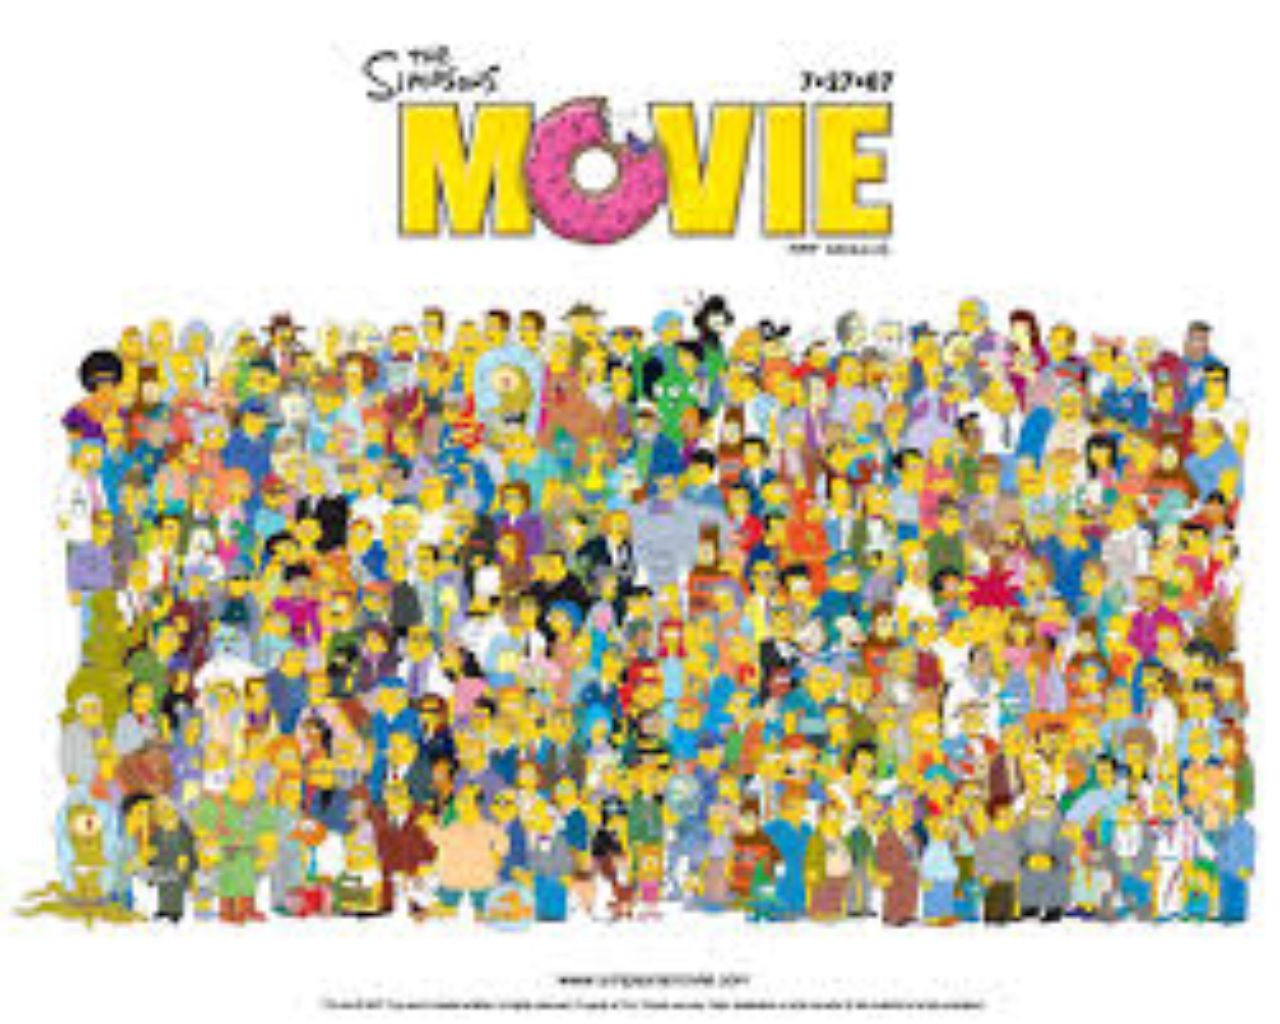 File:The simpsons movie.jpg